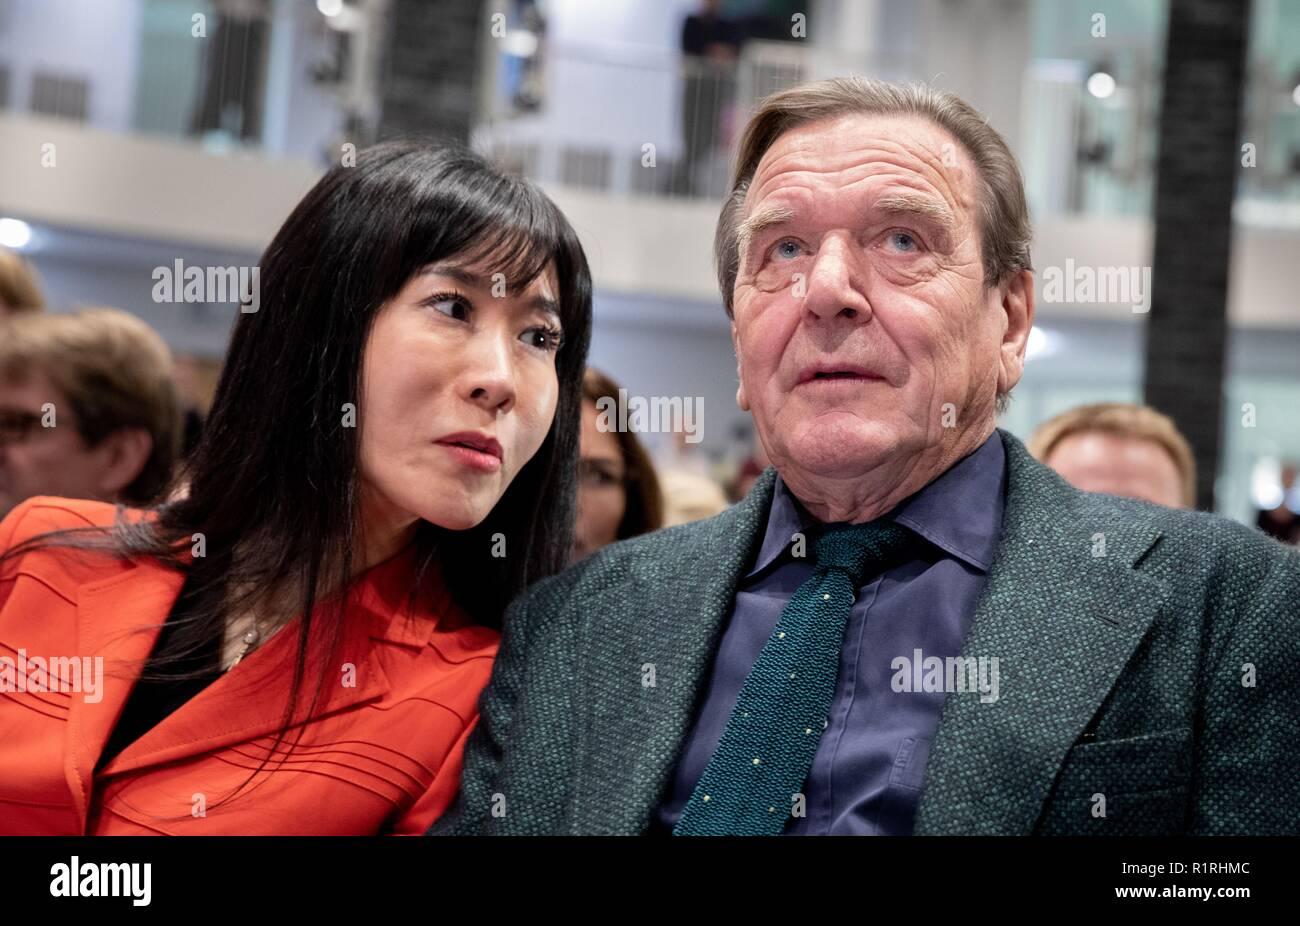 Berlin, Germany. 05th Nov, 2018. Soyeon Schroeder-Kim and Gerhard Schroeder on November 5, 2018. Credit: Kay Nietfeld/dpa/Alamy Live News - Stock Image